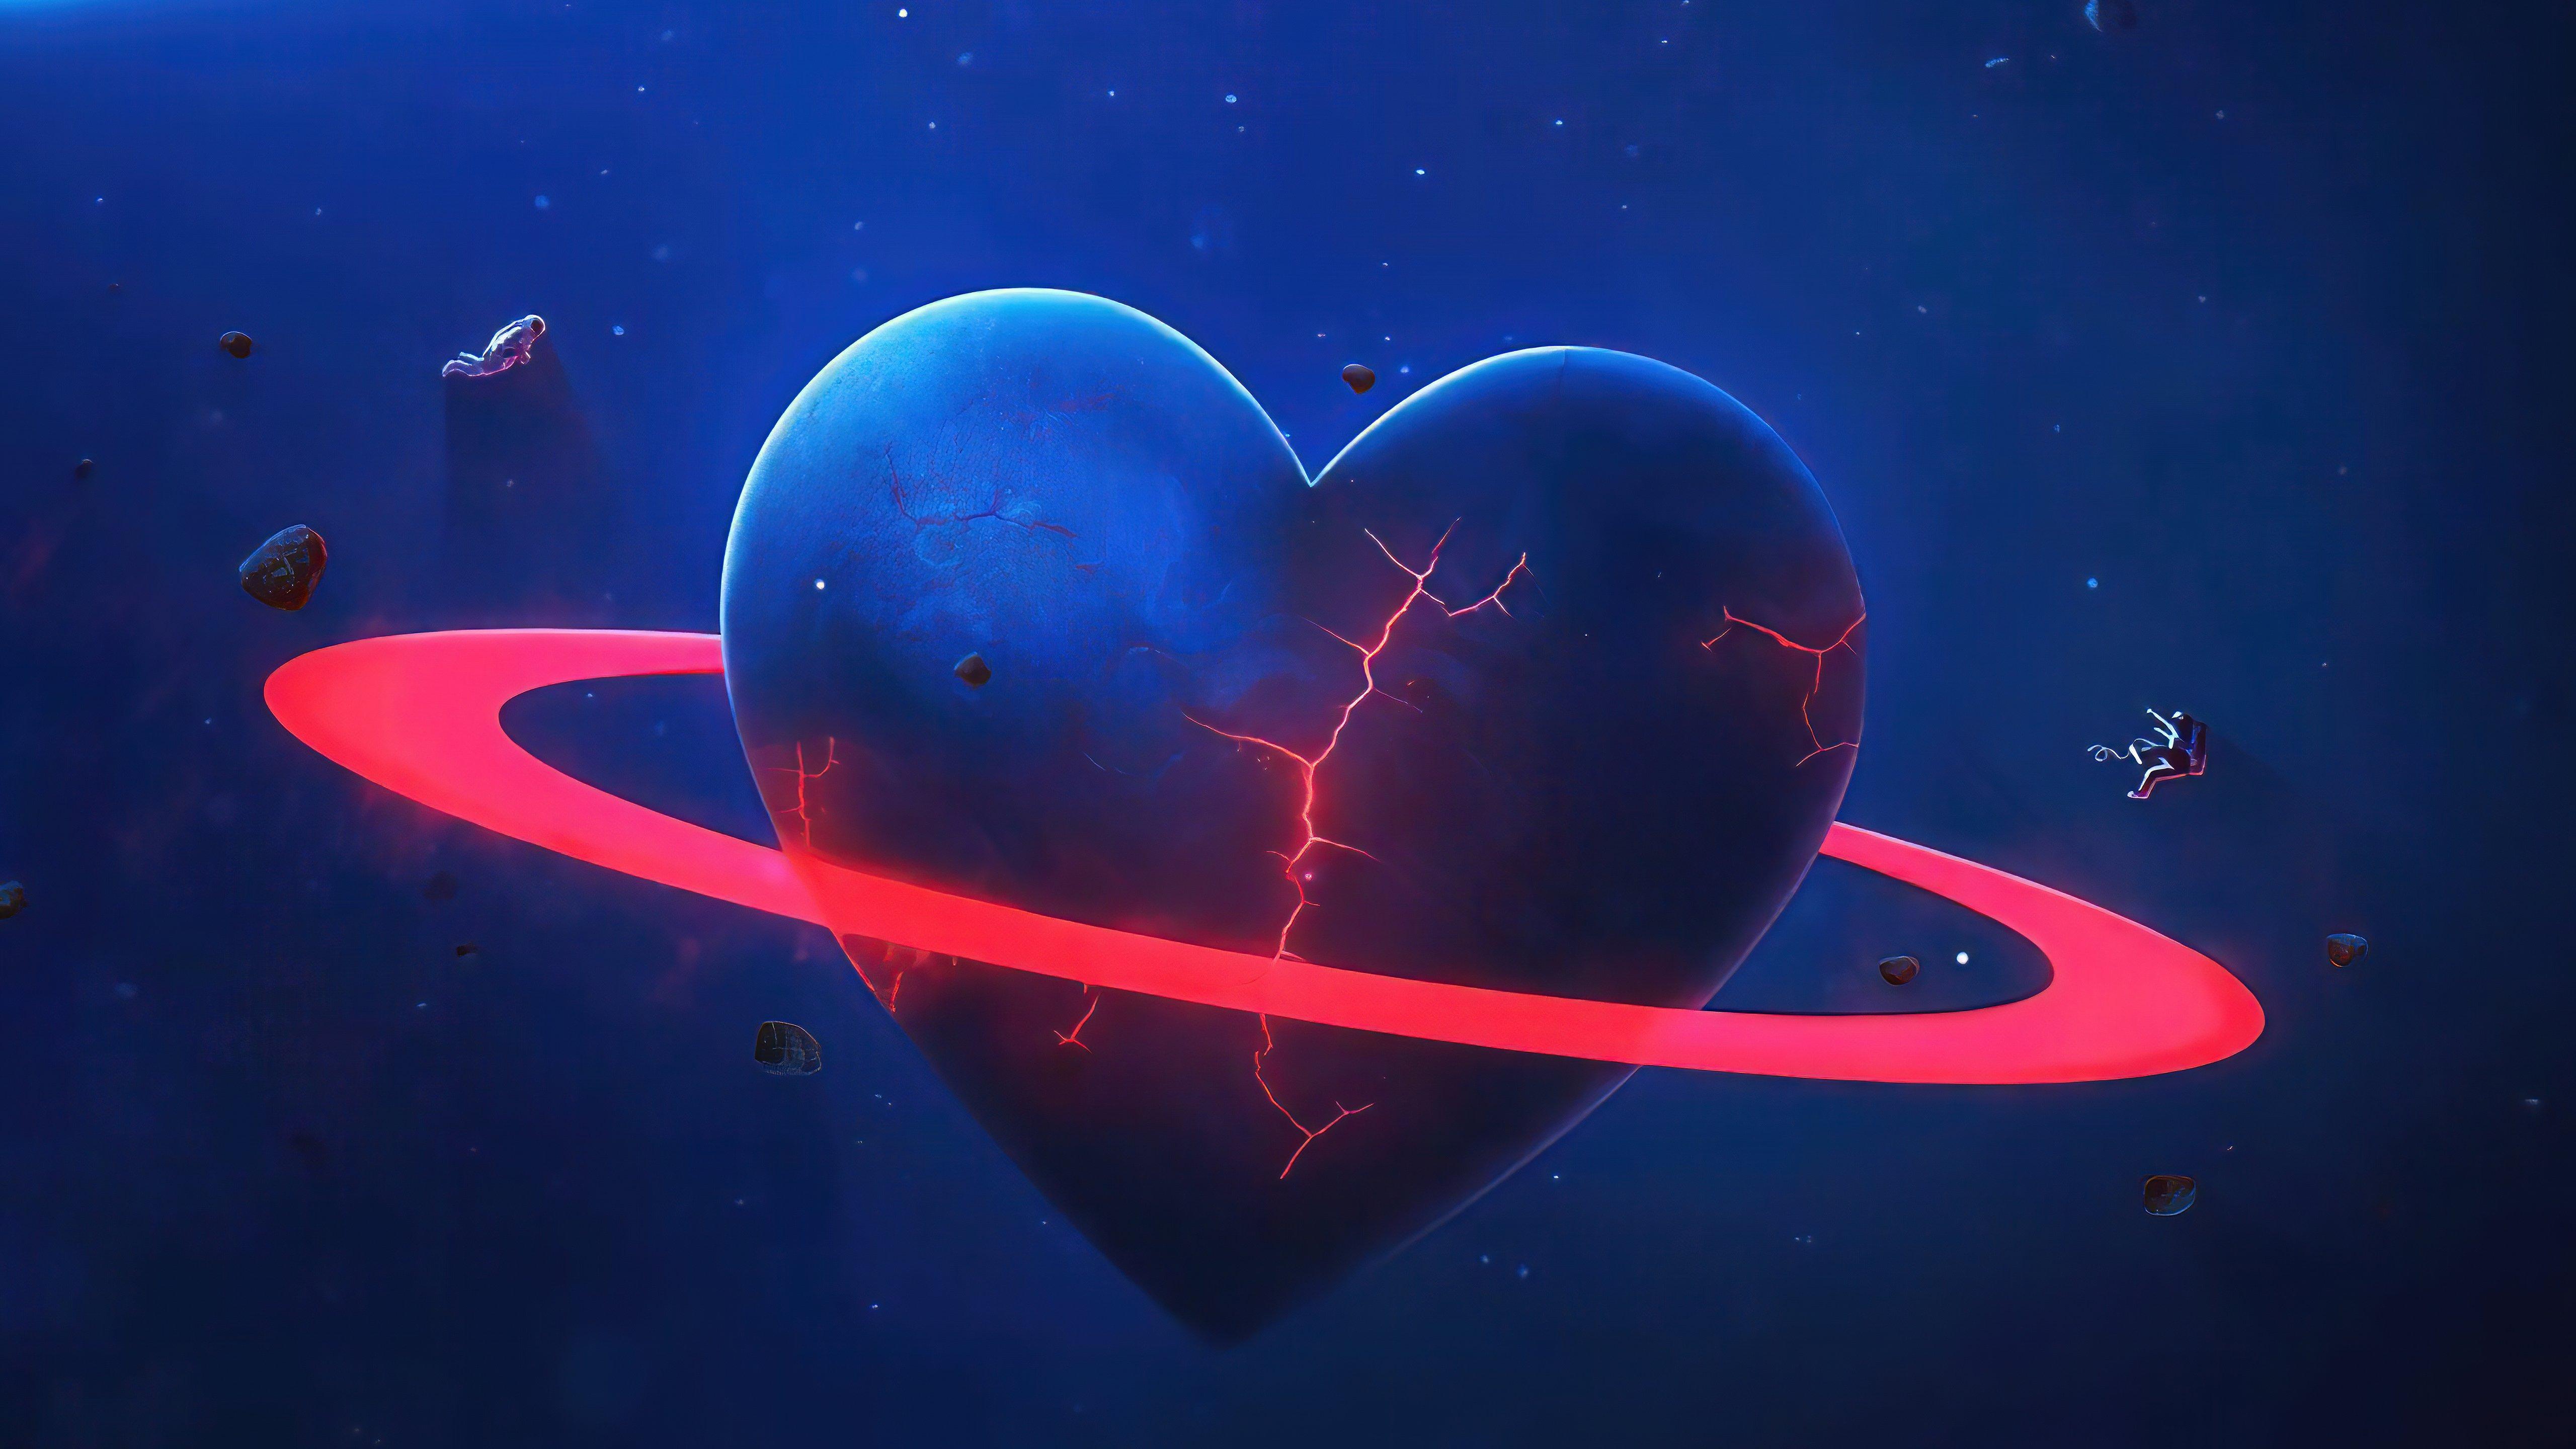 Wallpaper Heart-shaped planet